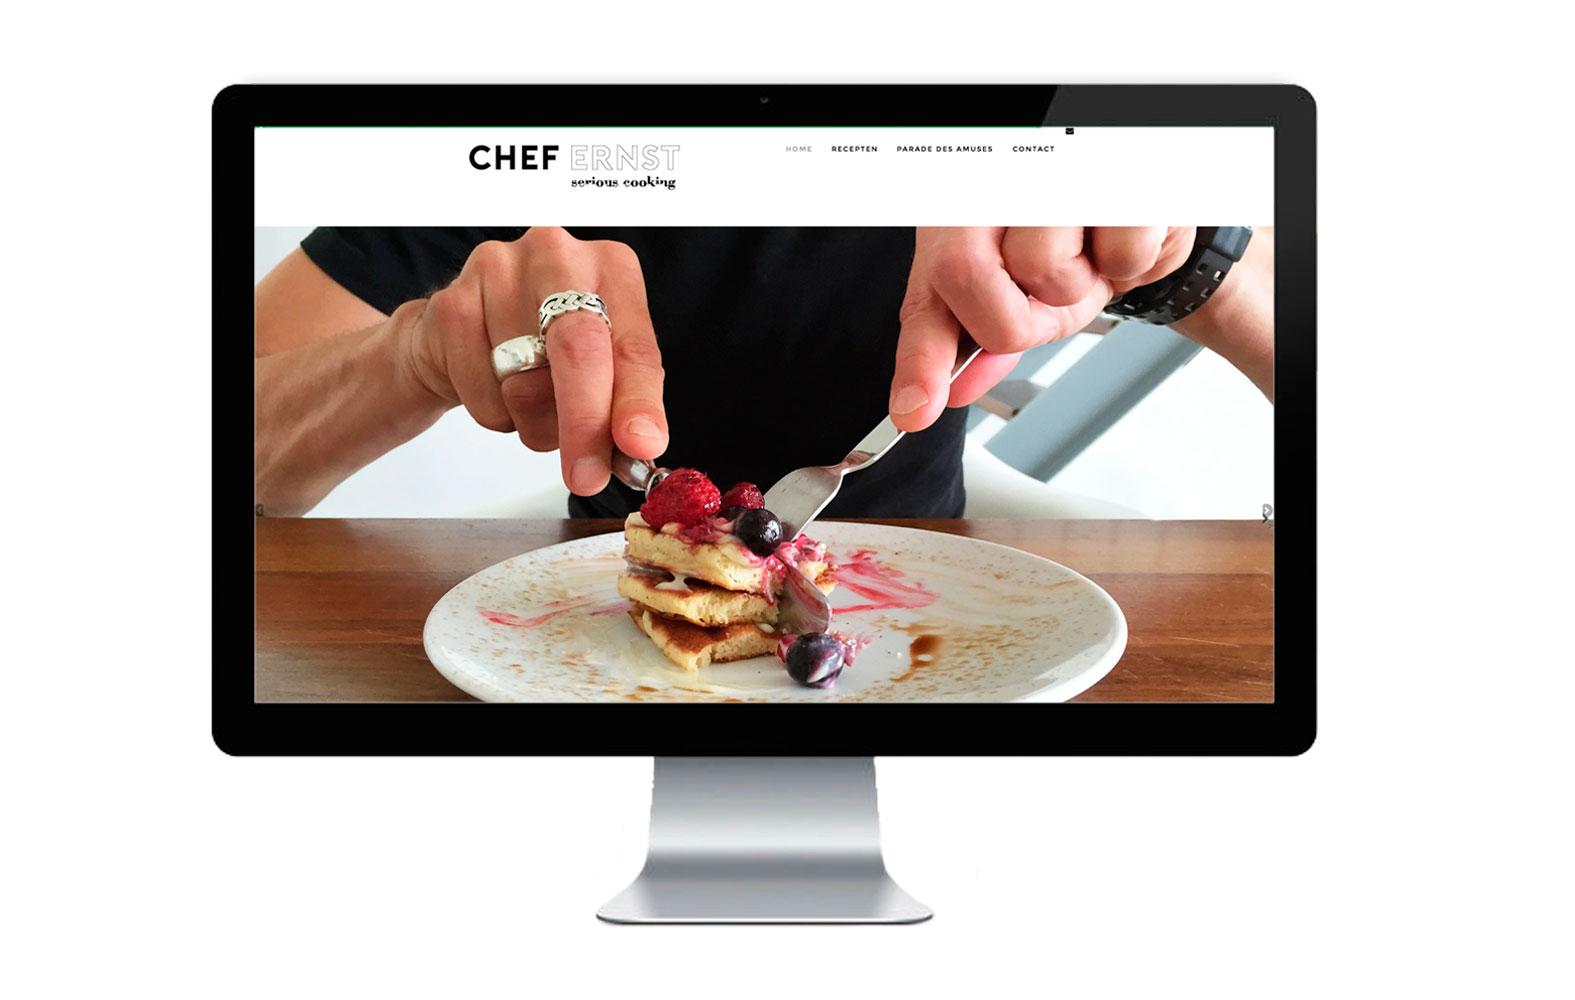 Chef-Ernst-serious-cooking-website-home-Studio-Ernst